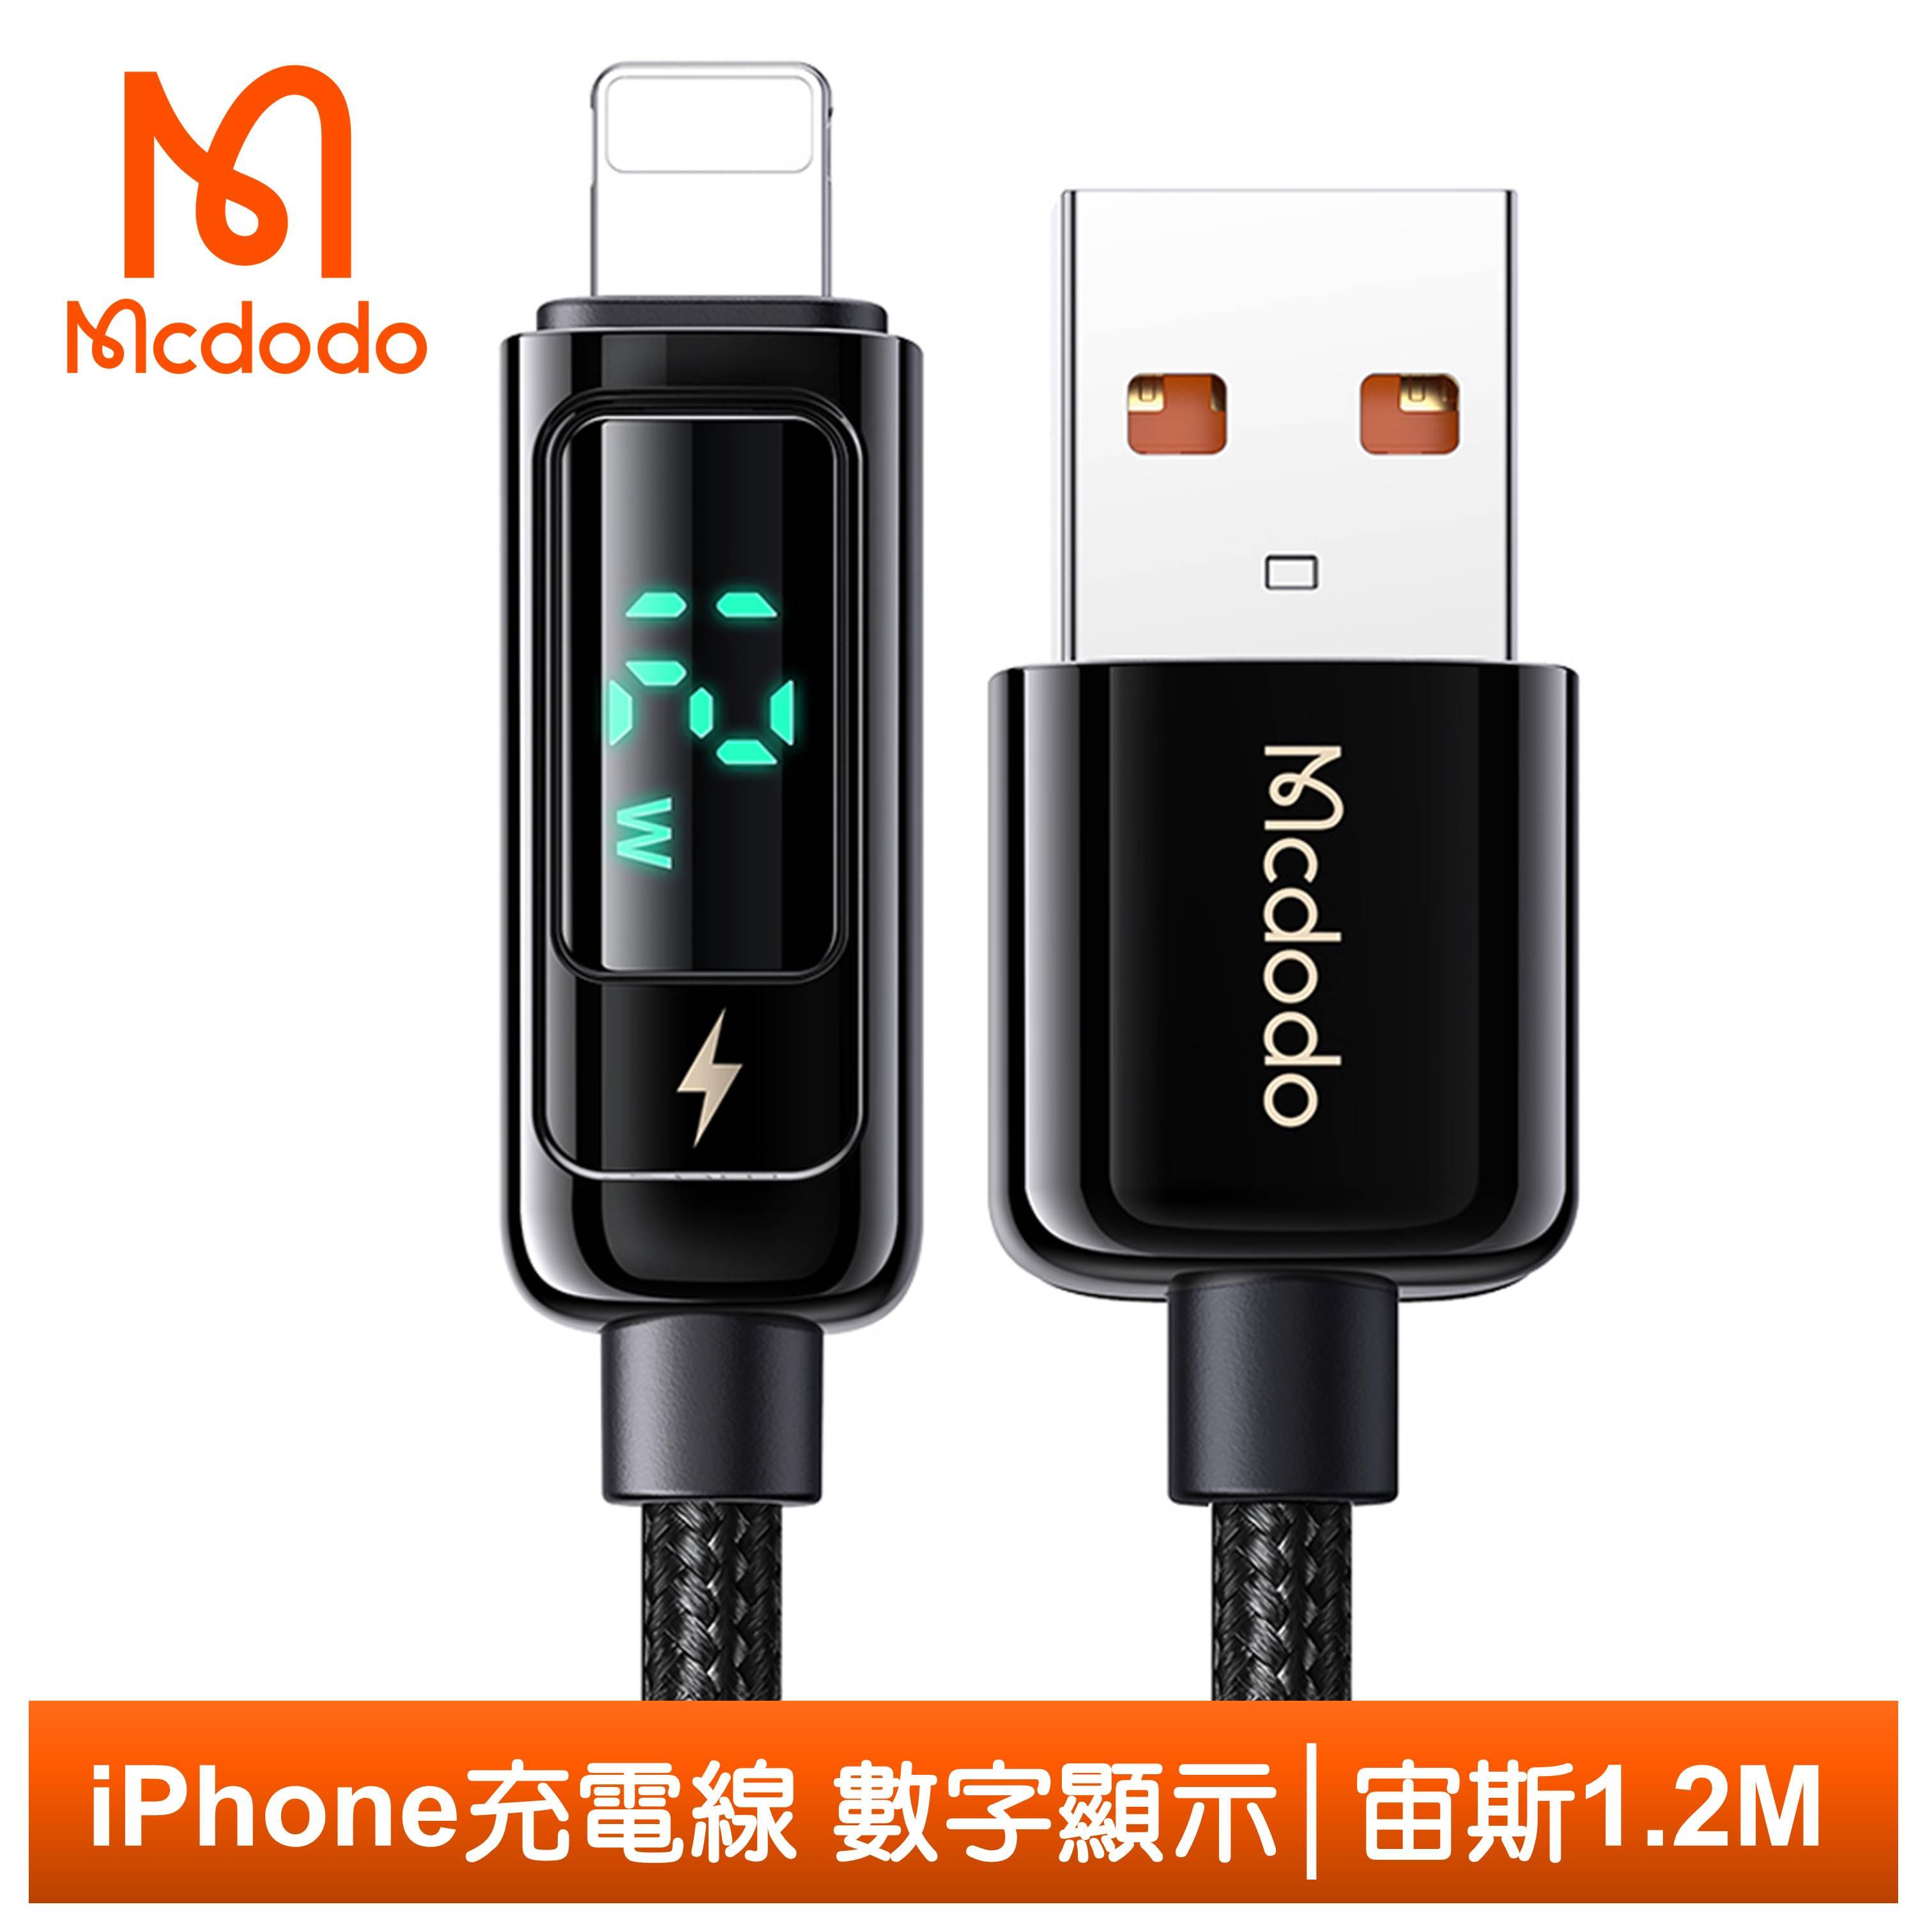 Mcdodo麥多多台灣官方 Lightning/iPhone充電線傳輸線快充線編織 功率數顯 宙斯系列 1.2M 黑色